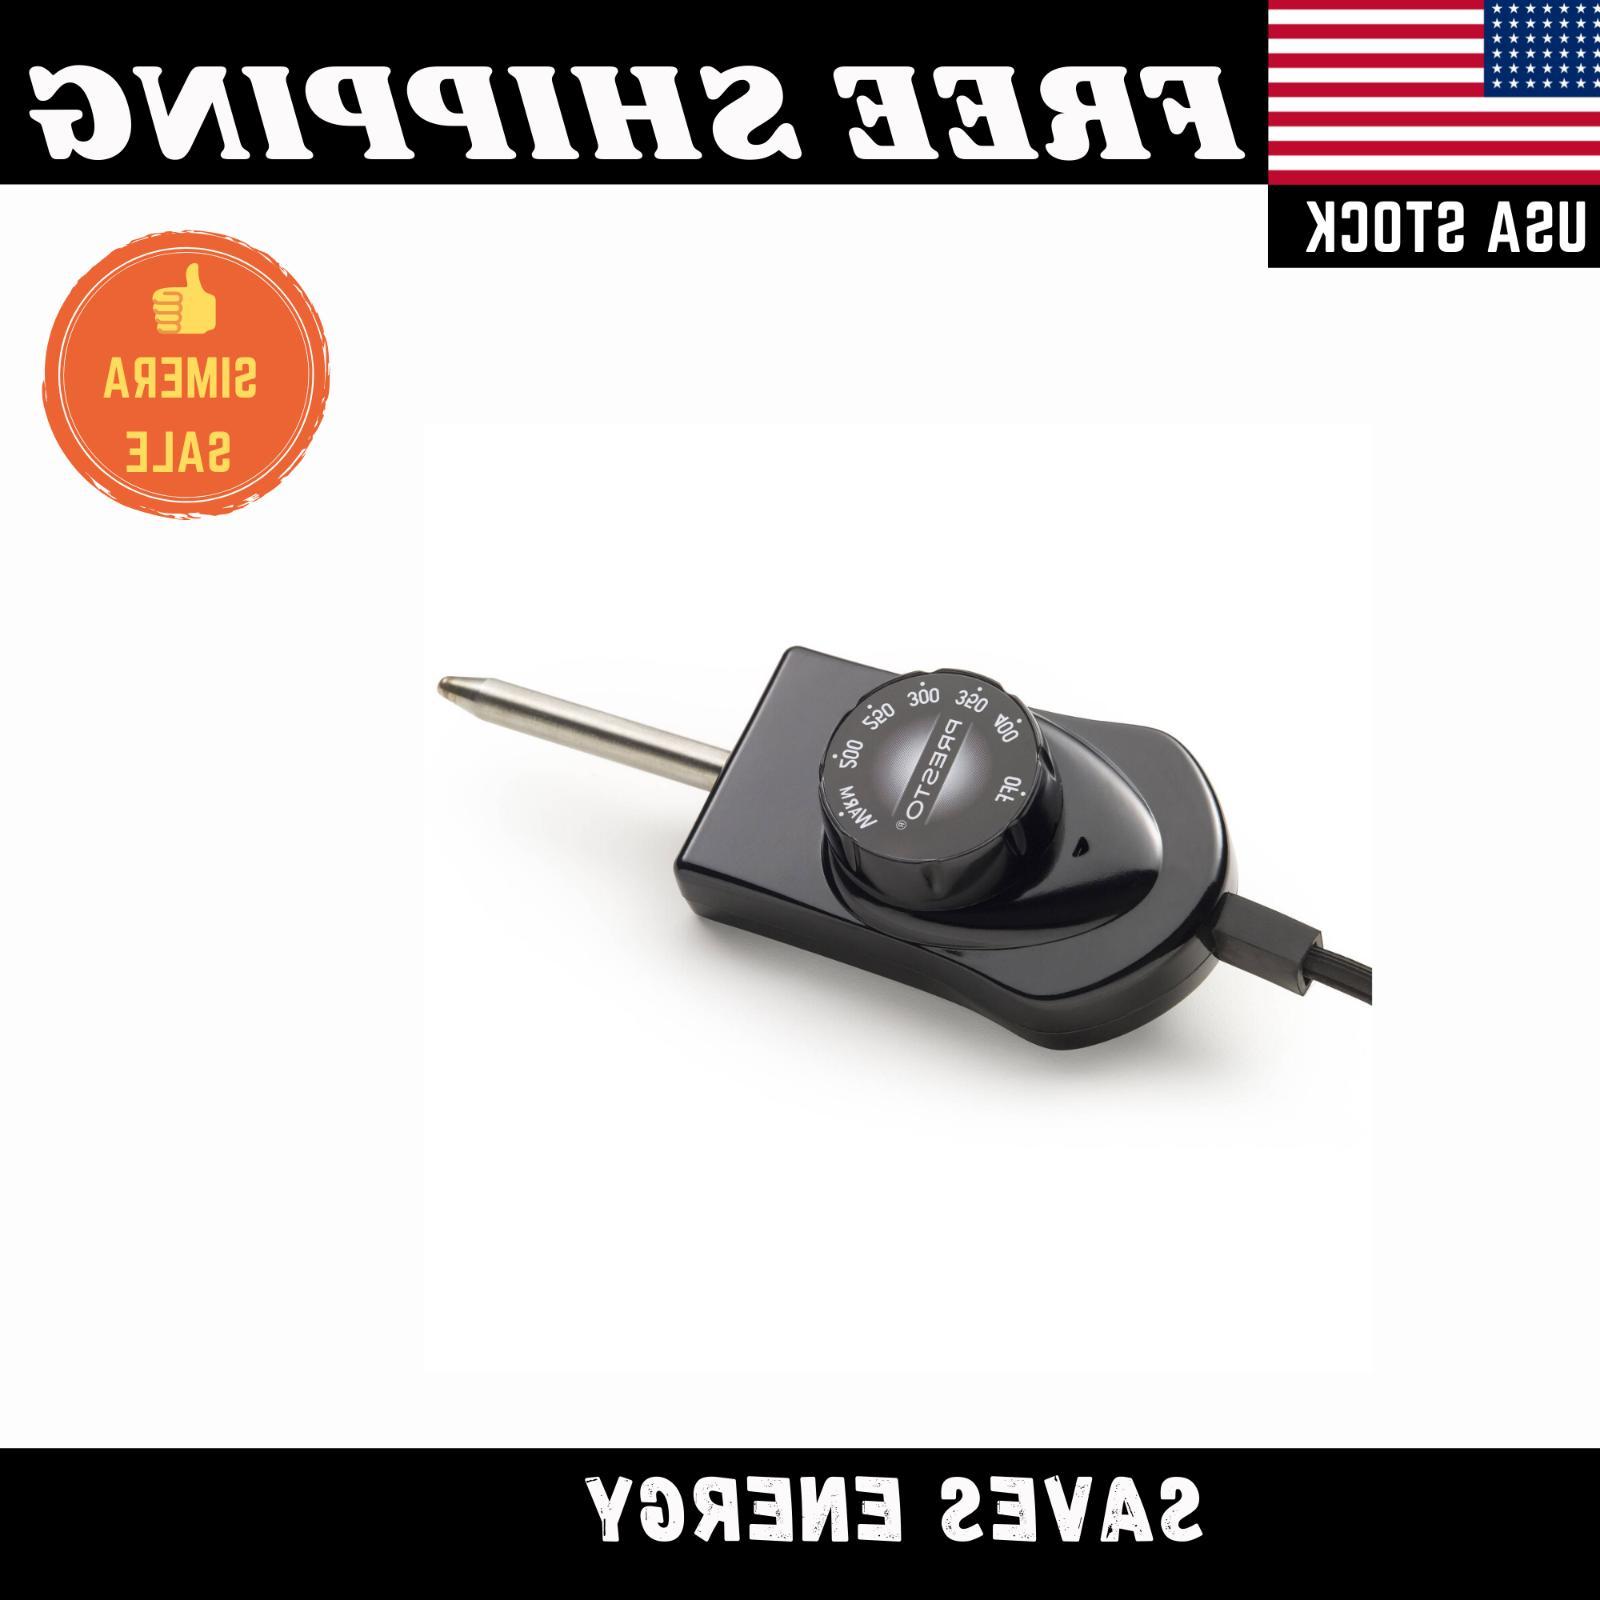 "16"" Electric Frying Fry Server W/ Glass Black"